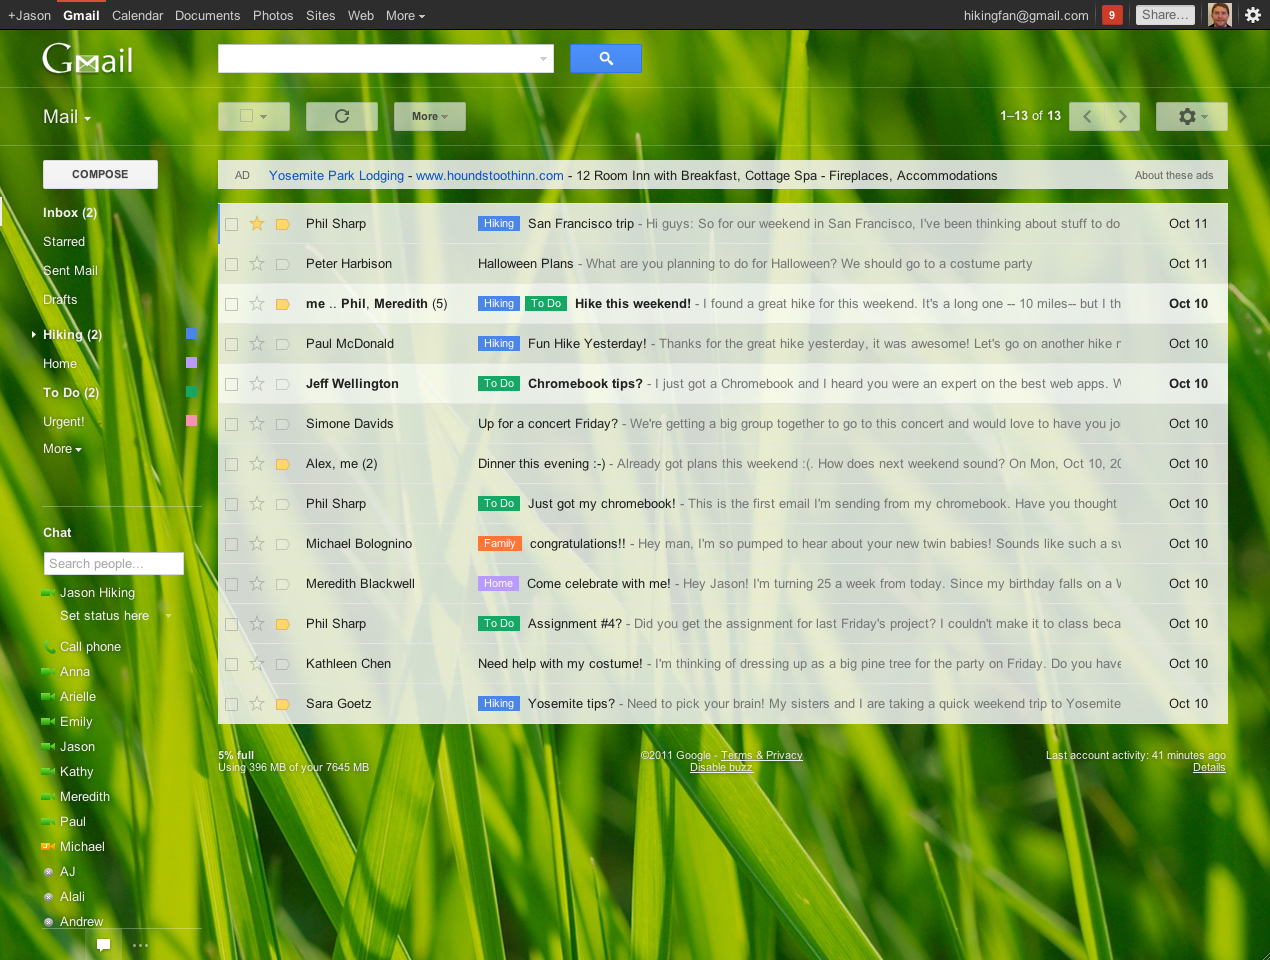 Gmail themes background image - Gmail Themes Background Image 43